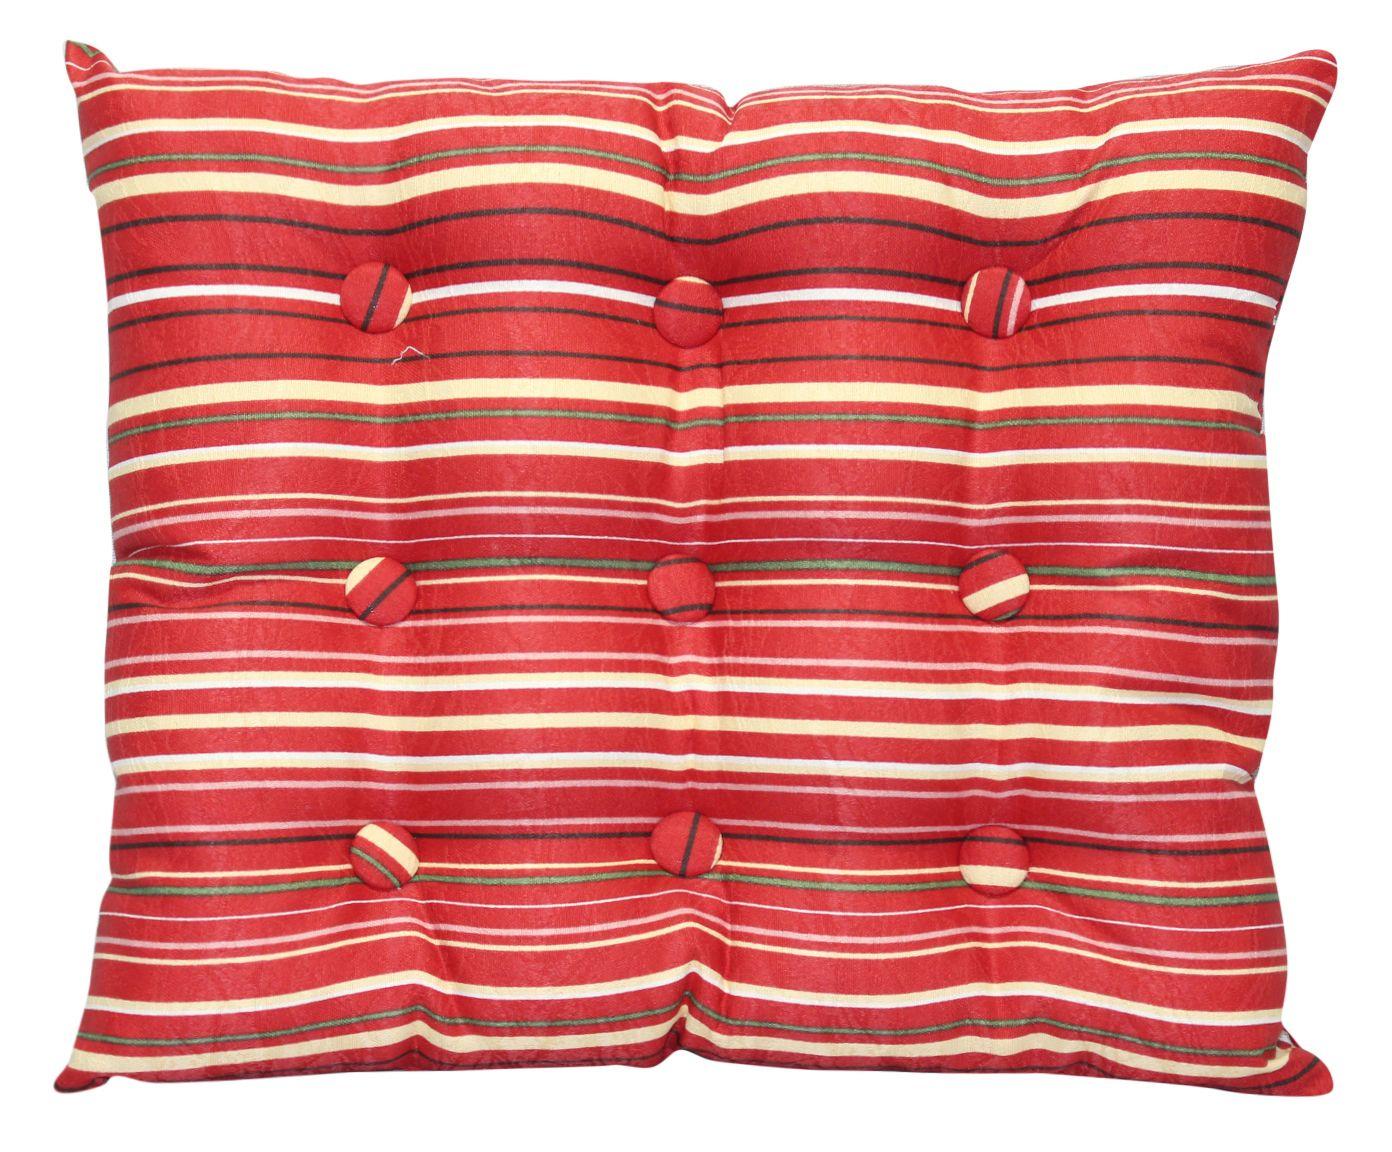 Almofada Zabuton Marble Striped Vermelha - 40x50cm | Westwing.com.br